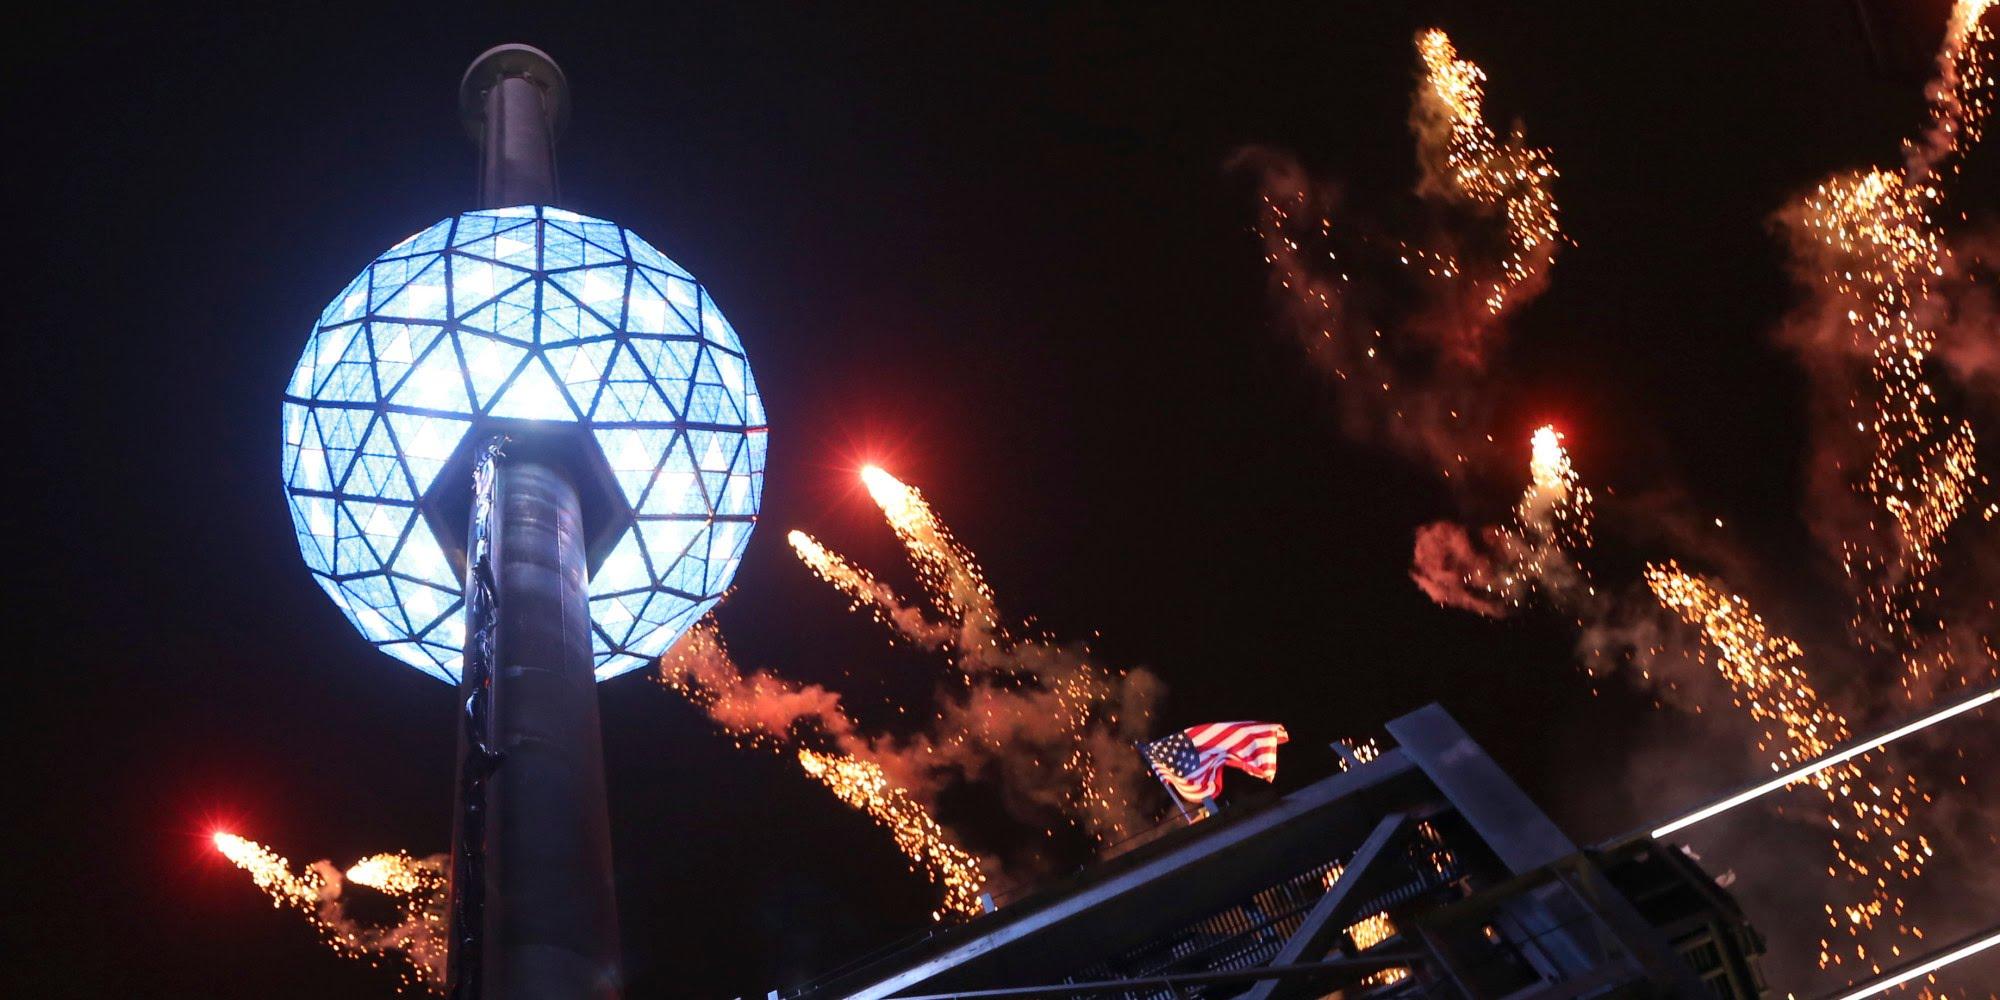 new years ball drop.jpg